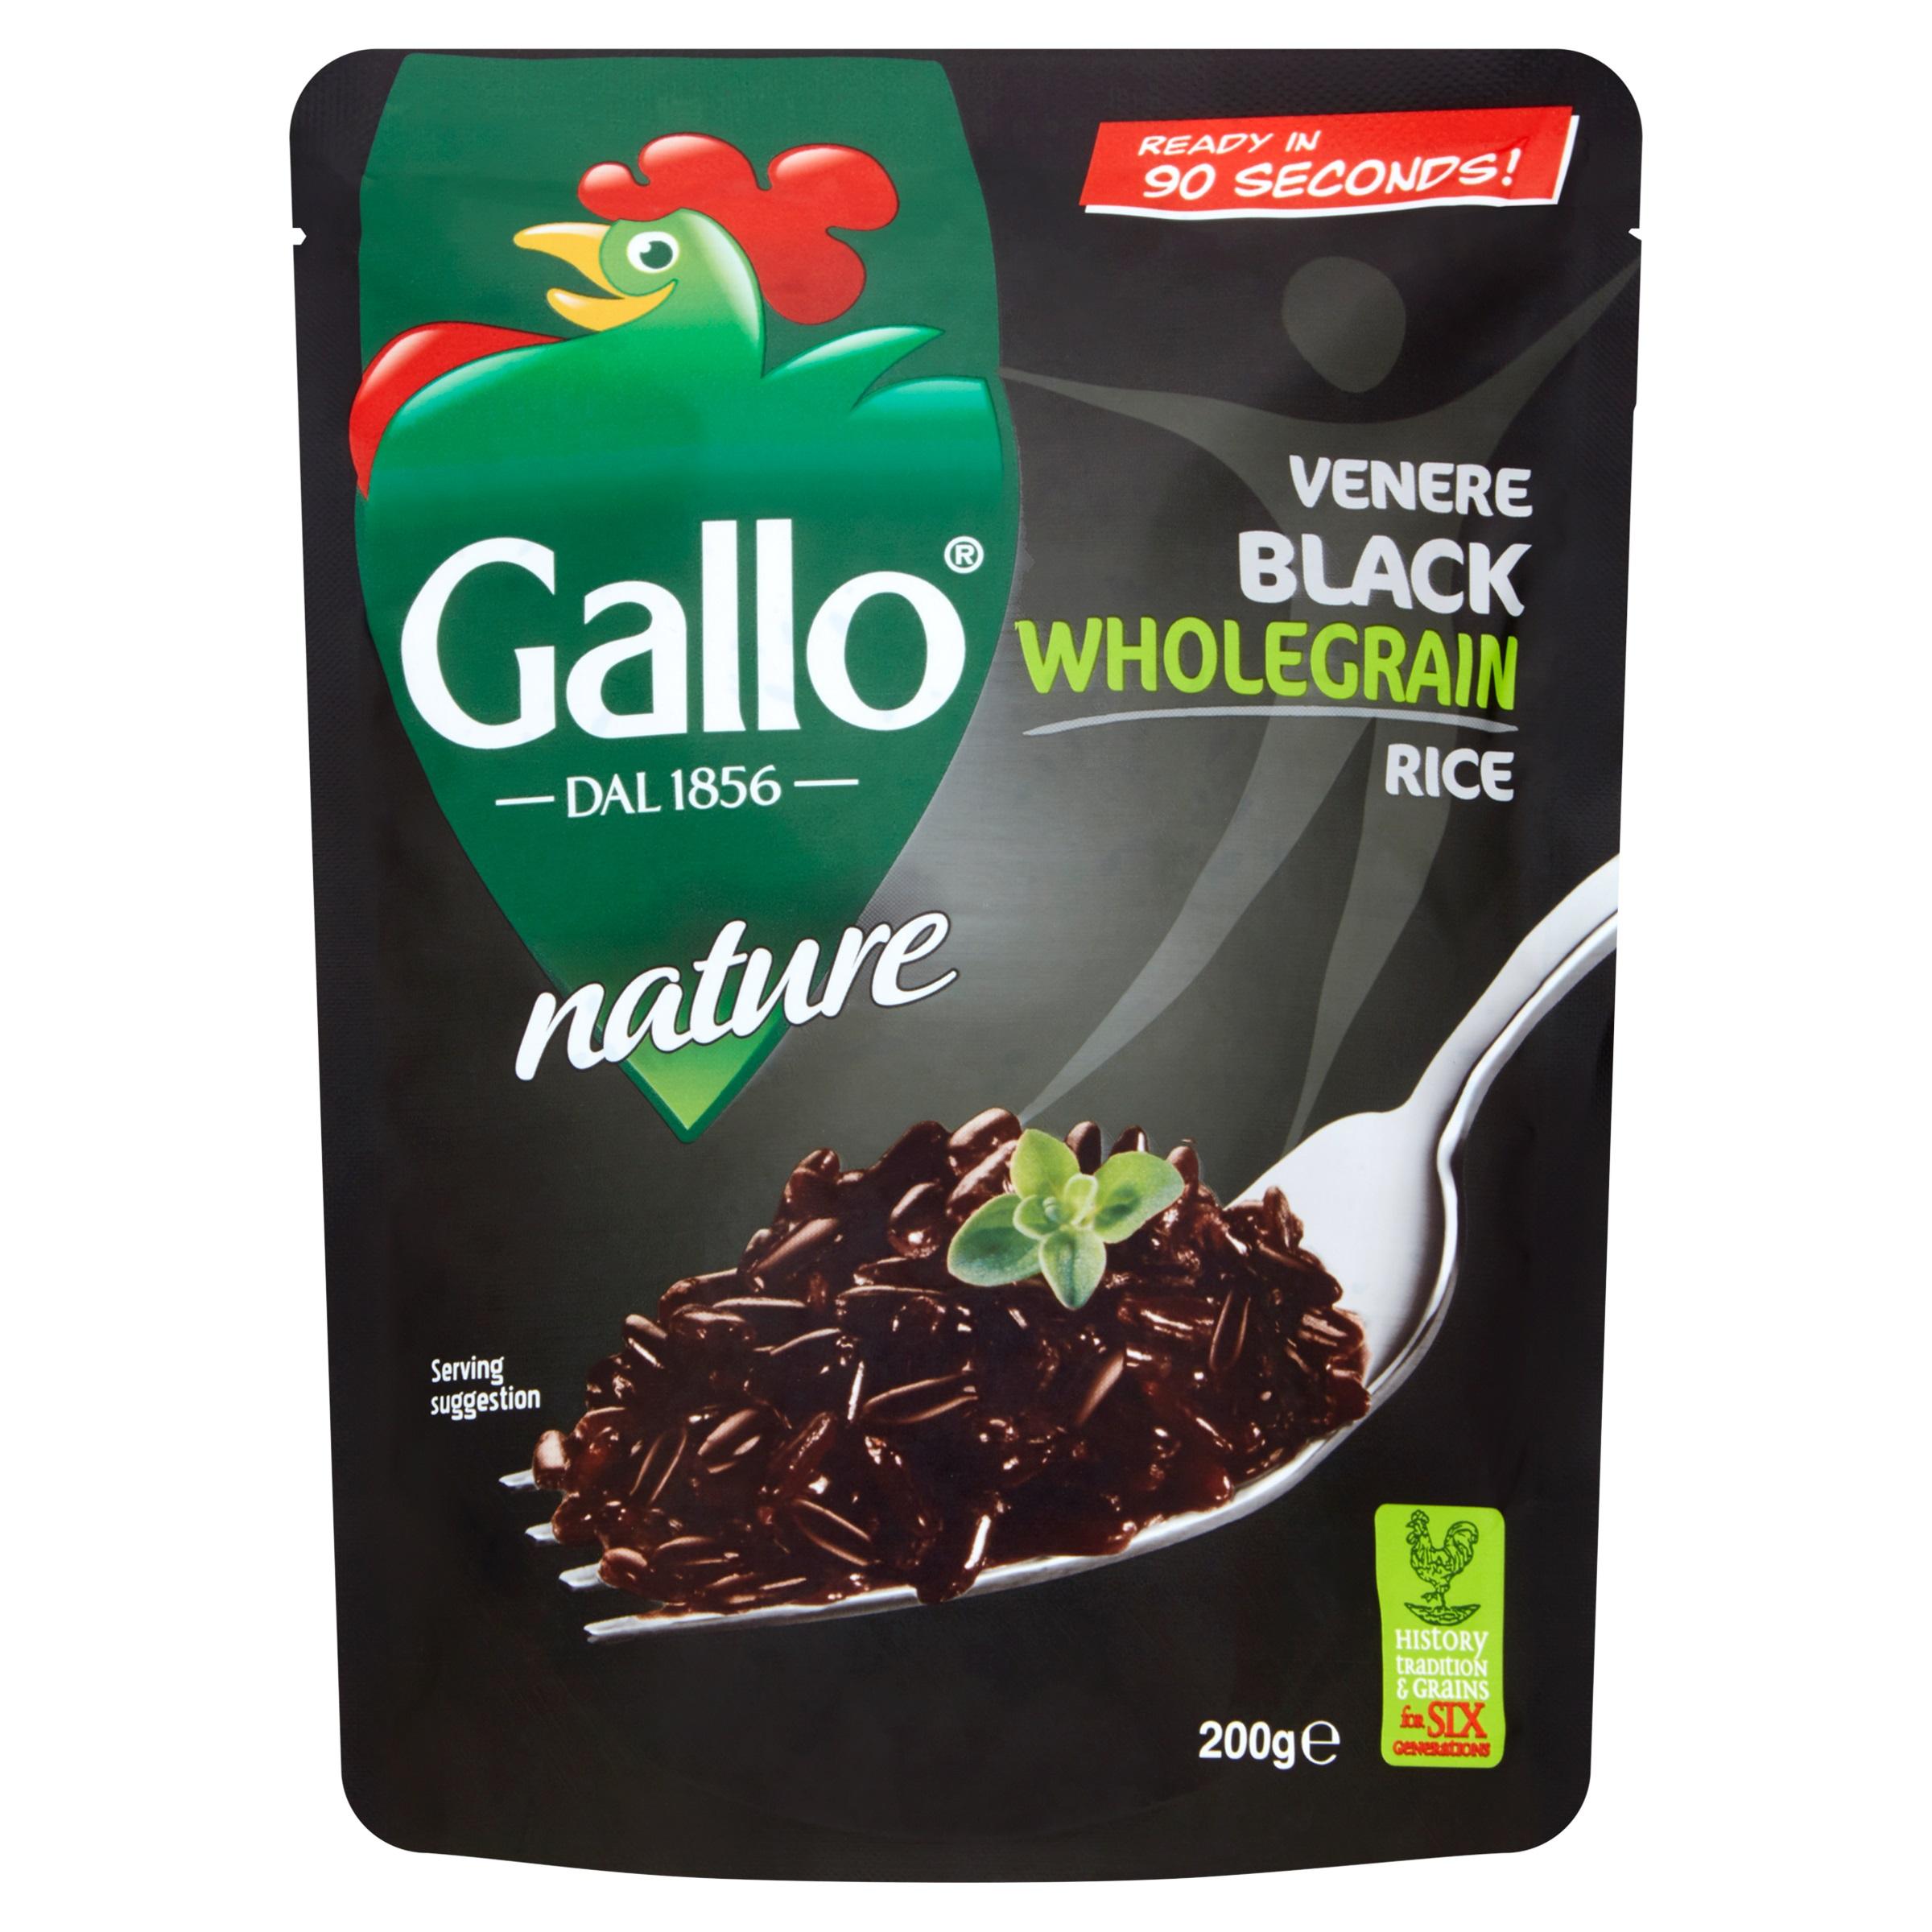 gallo venere black wholegrain rice